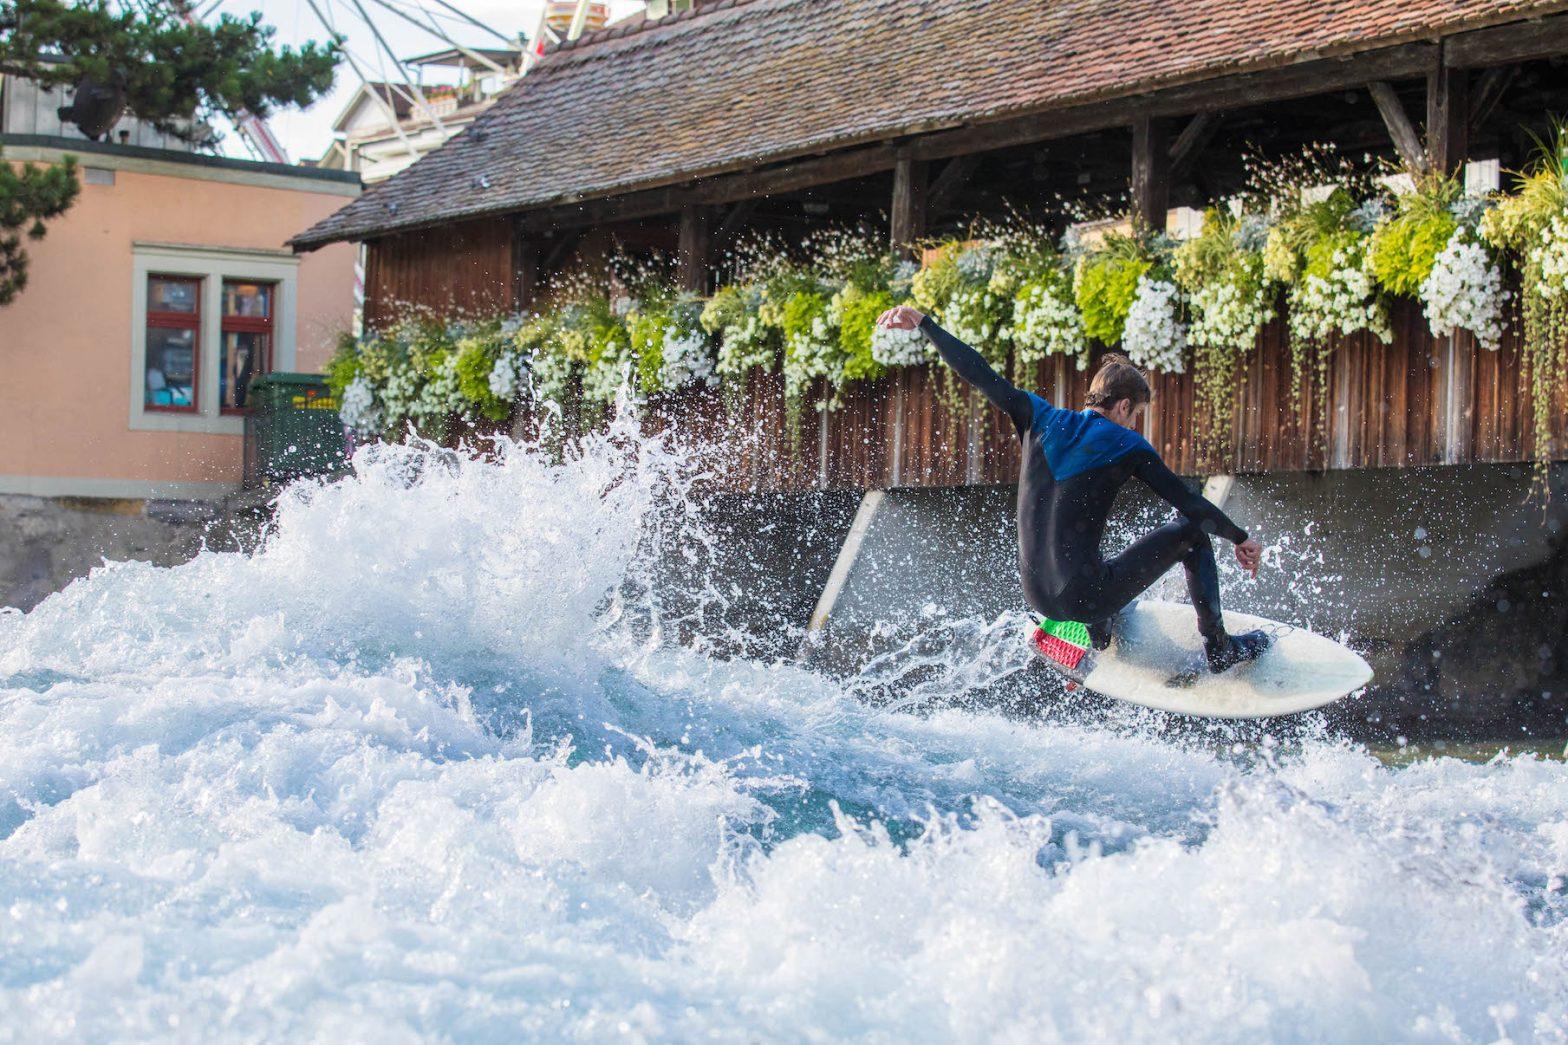 Thun's 2018 River Surf Jam